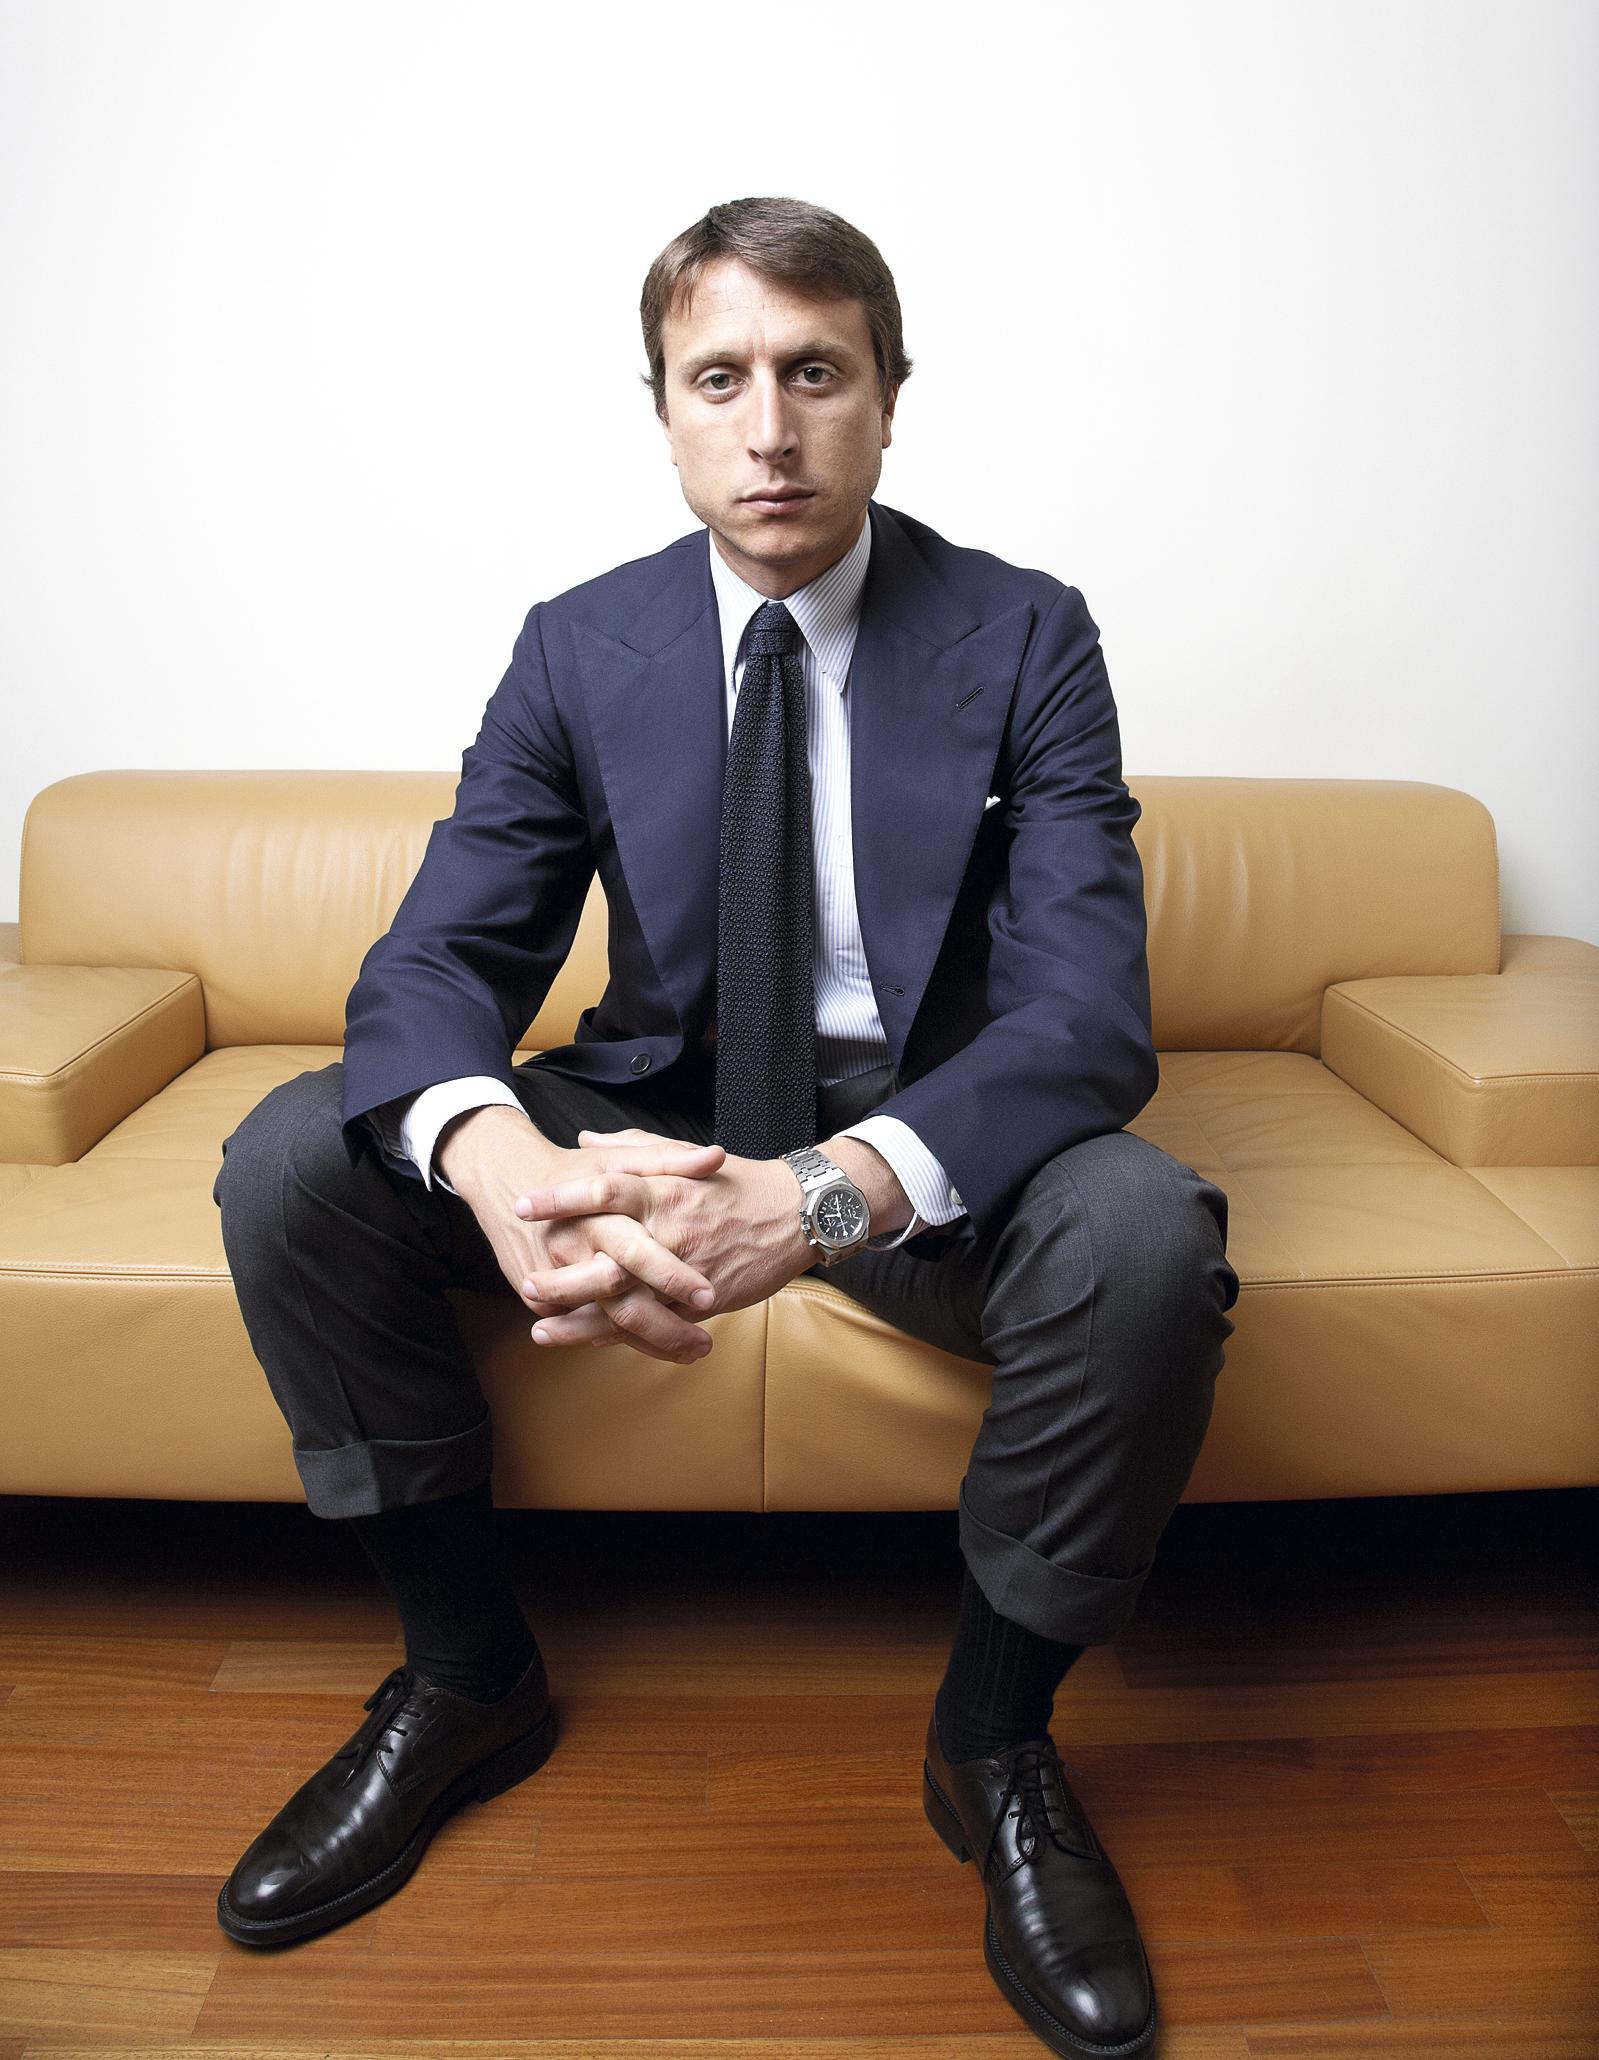 Poltrona Frau Montezemolo.Matteo Di Montezemolo Talks Personal Style How To Spend It